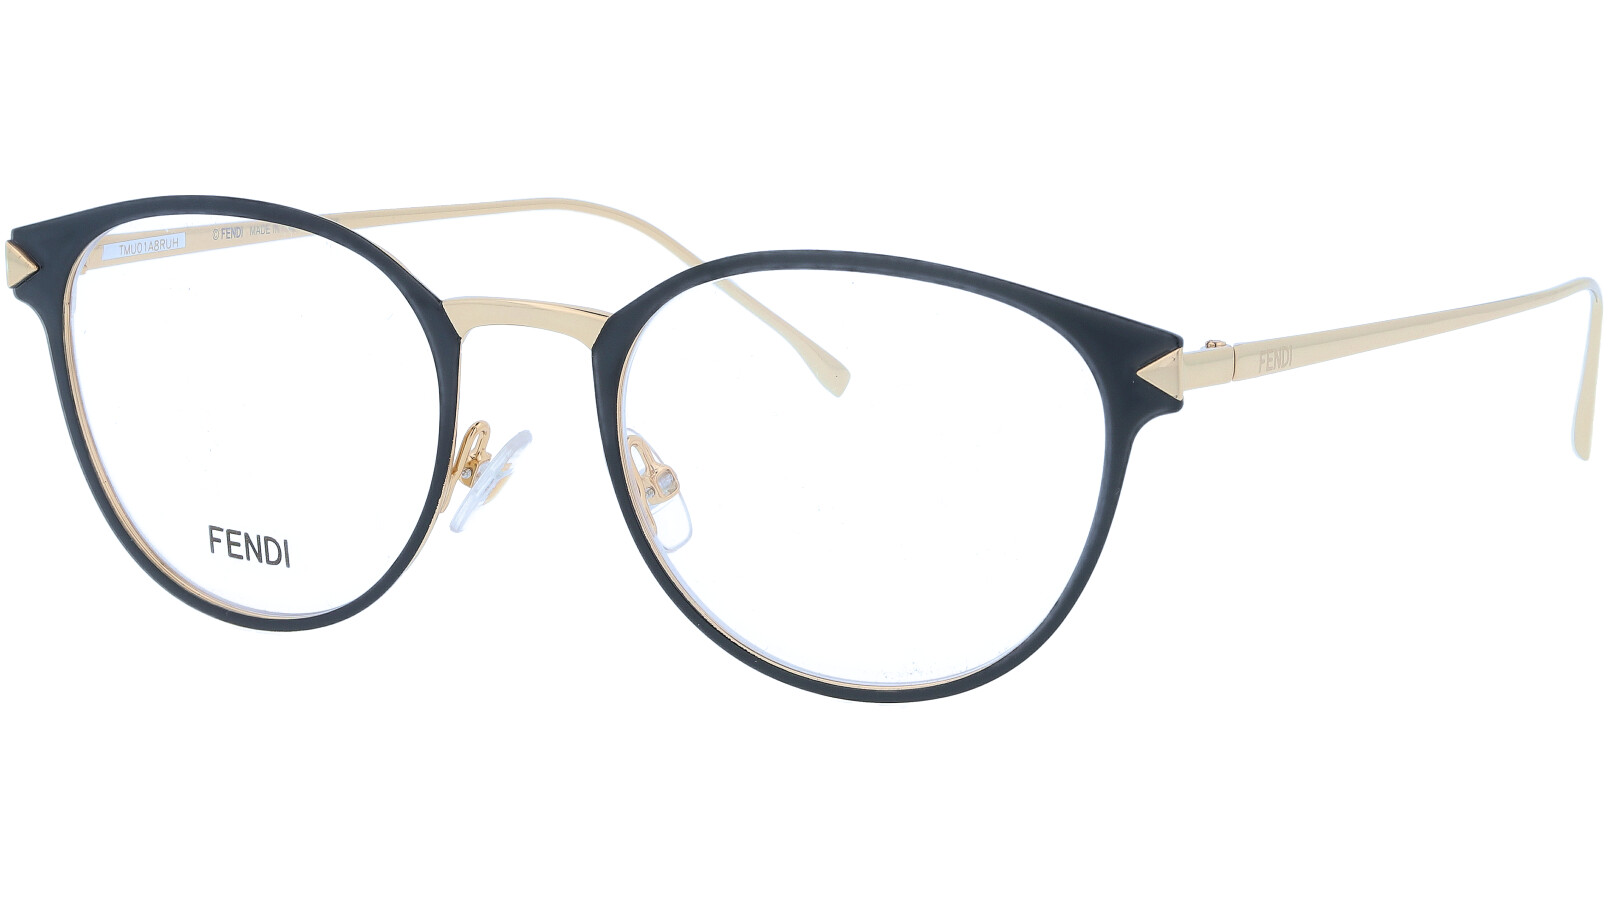 FENDI FF0167 FOG 50 BLACK Glasses